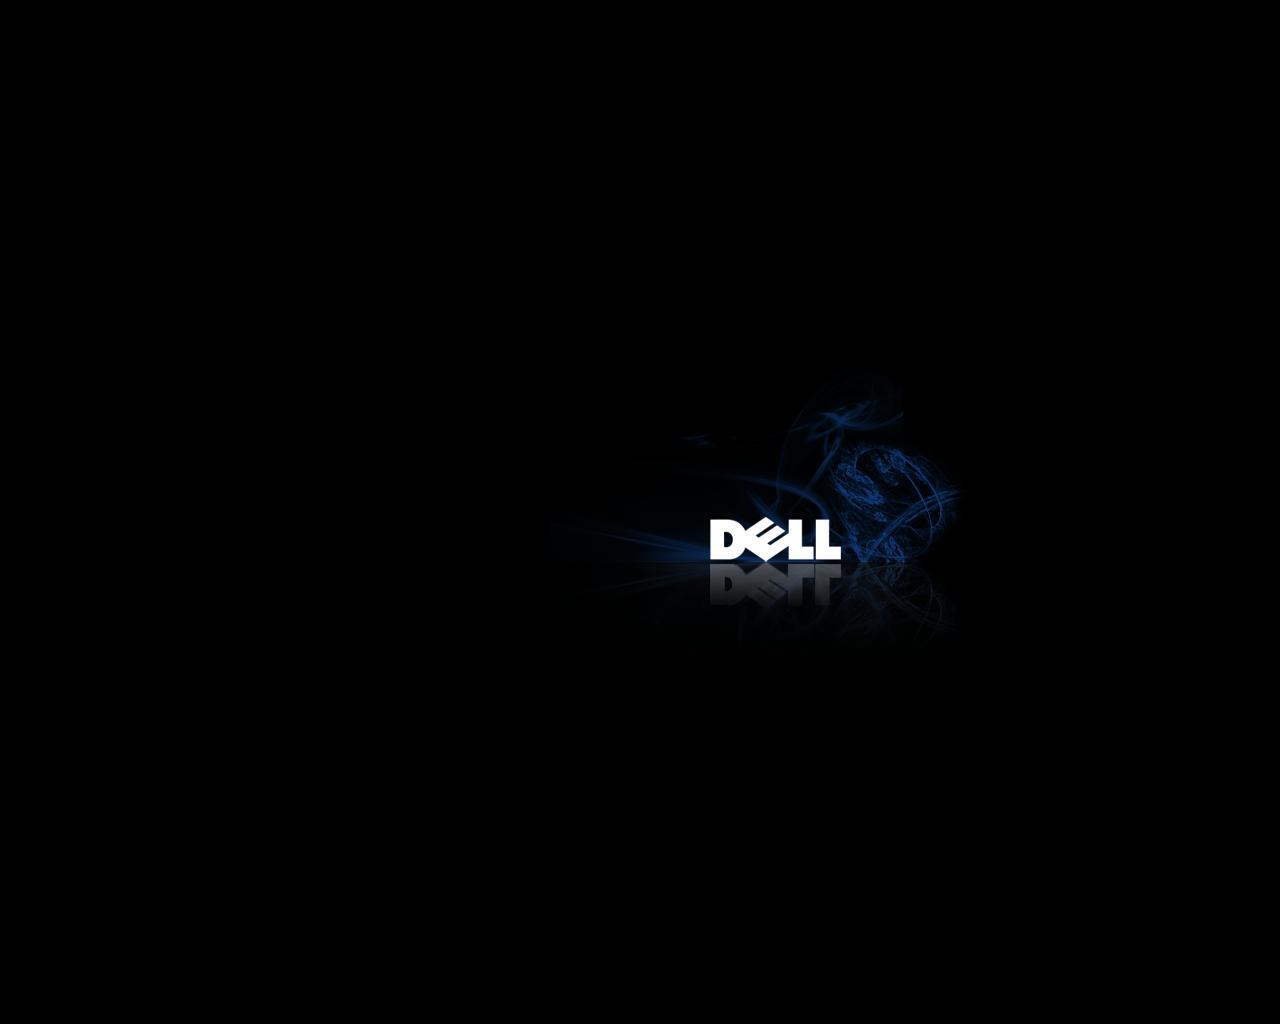 Dell Widescreen Wallpapers Dell Stuff in 2019 Cool desktop 1280x1024